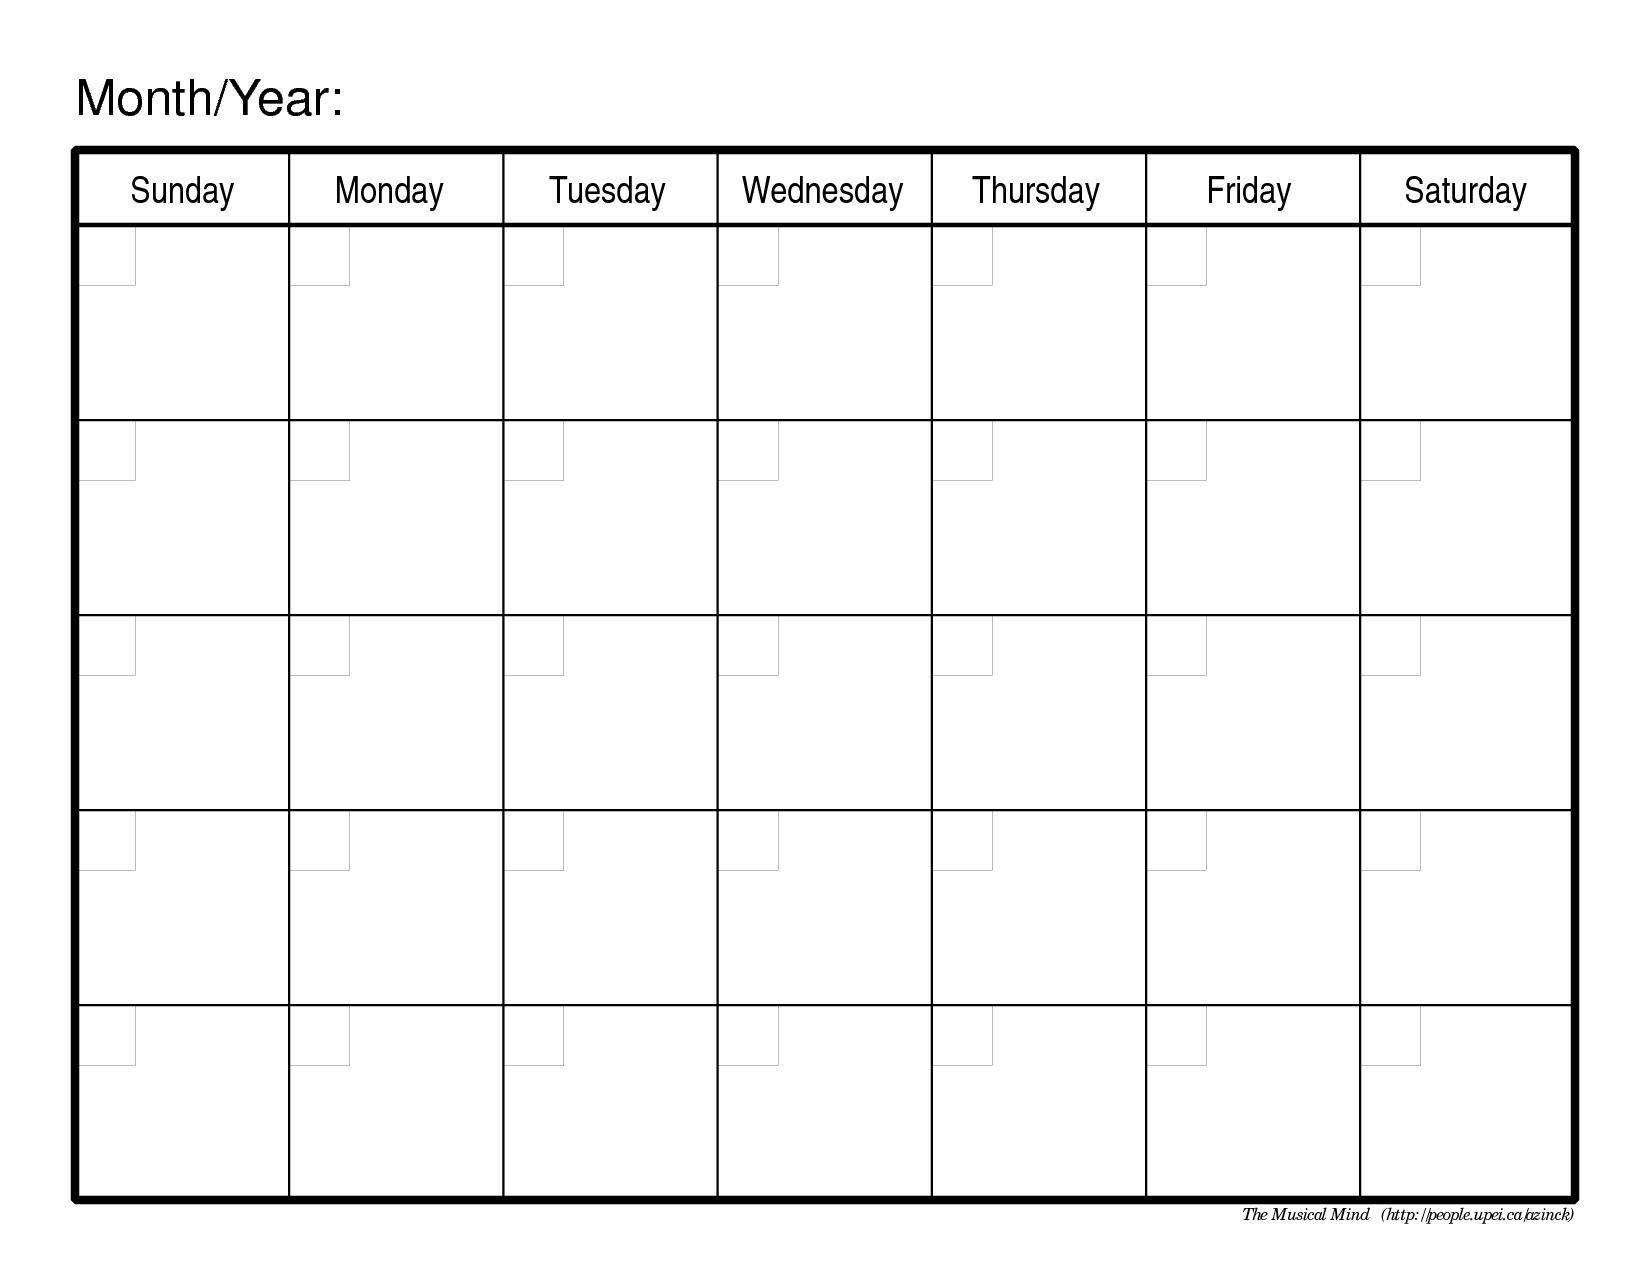 Monthly Calendar Template   Blank Calendar Pages, Free Calendar Template In Pages